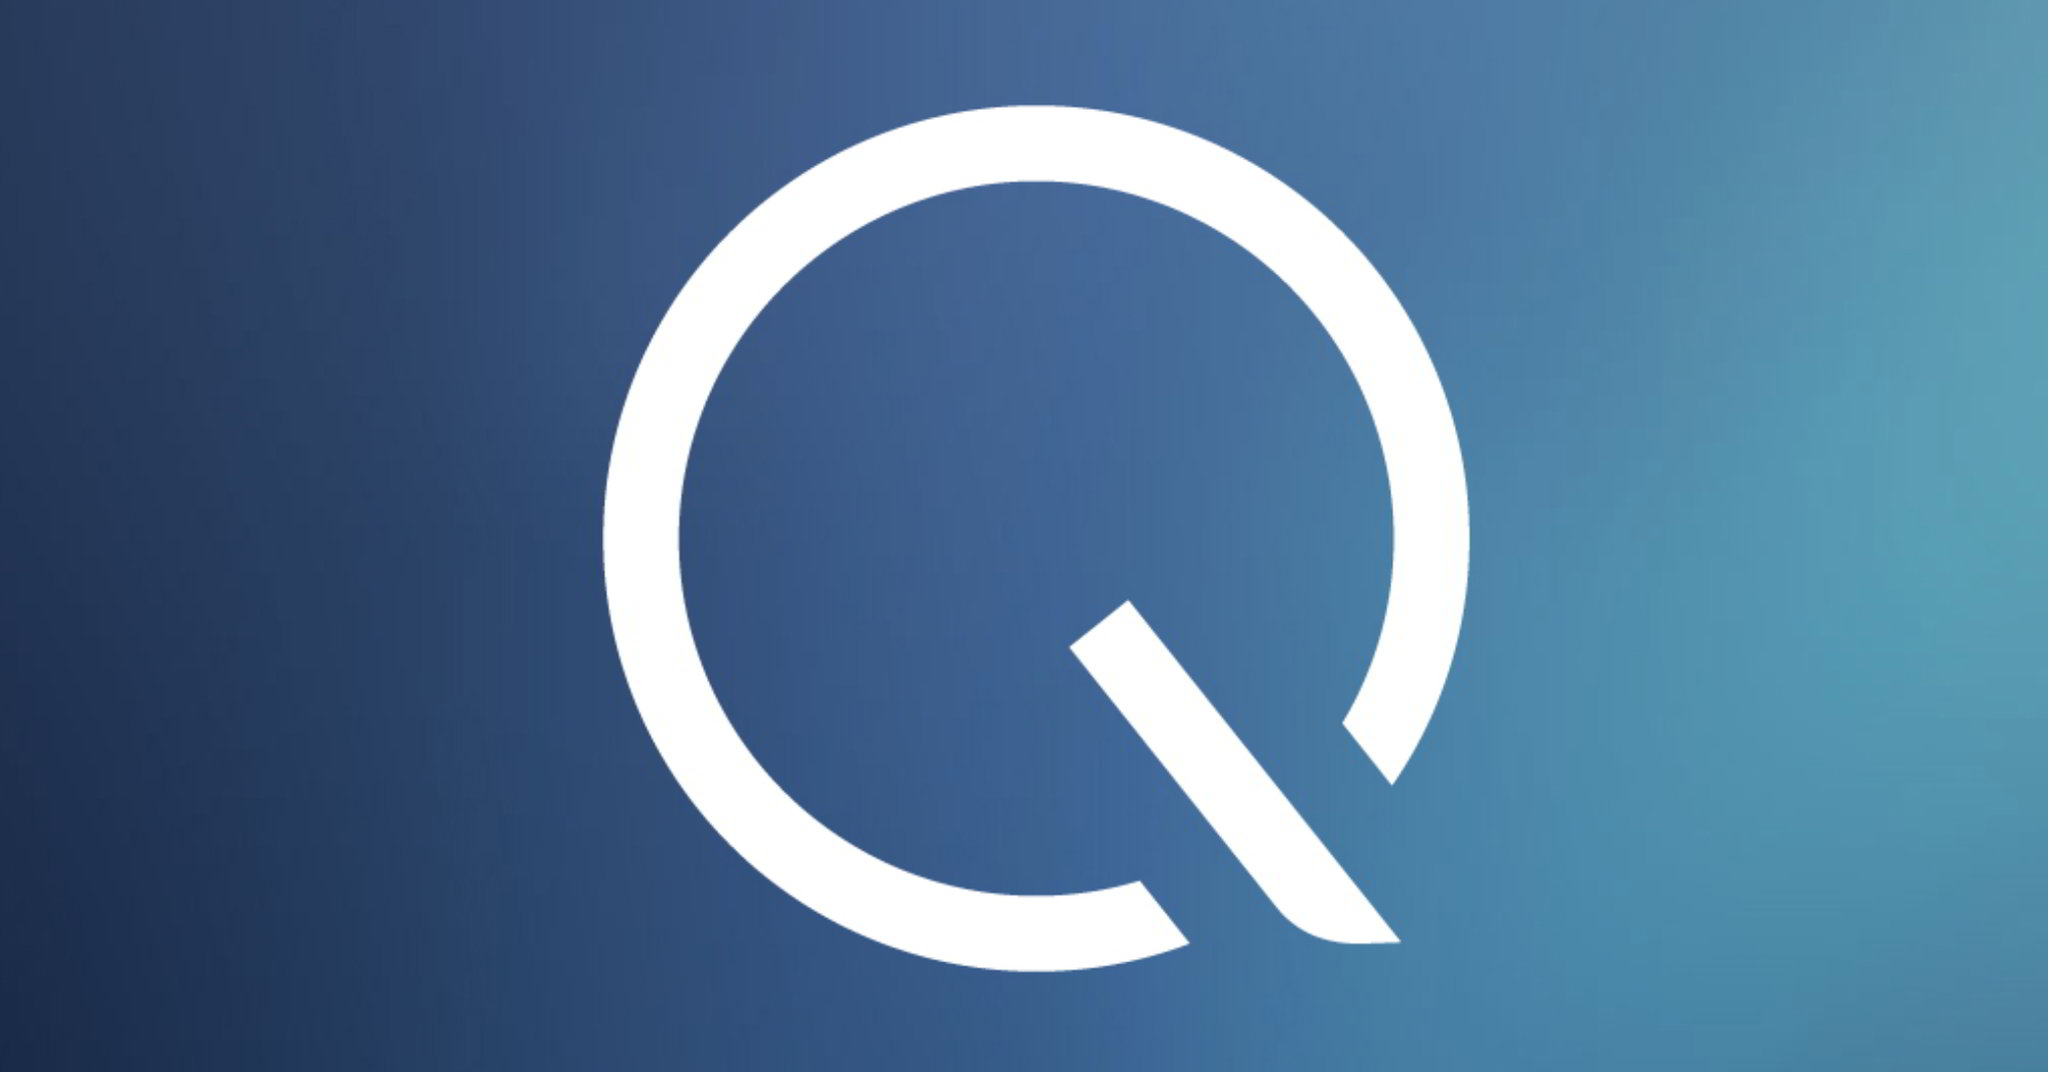 Qualee